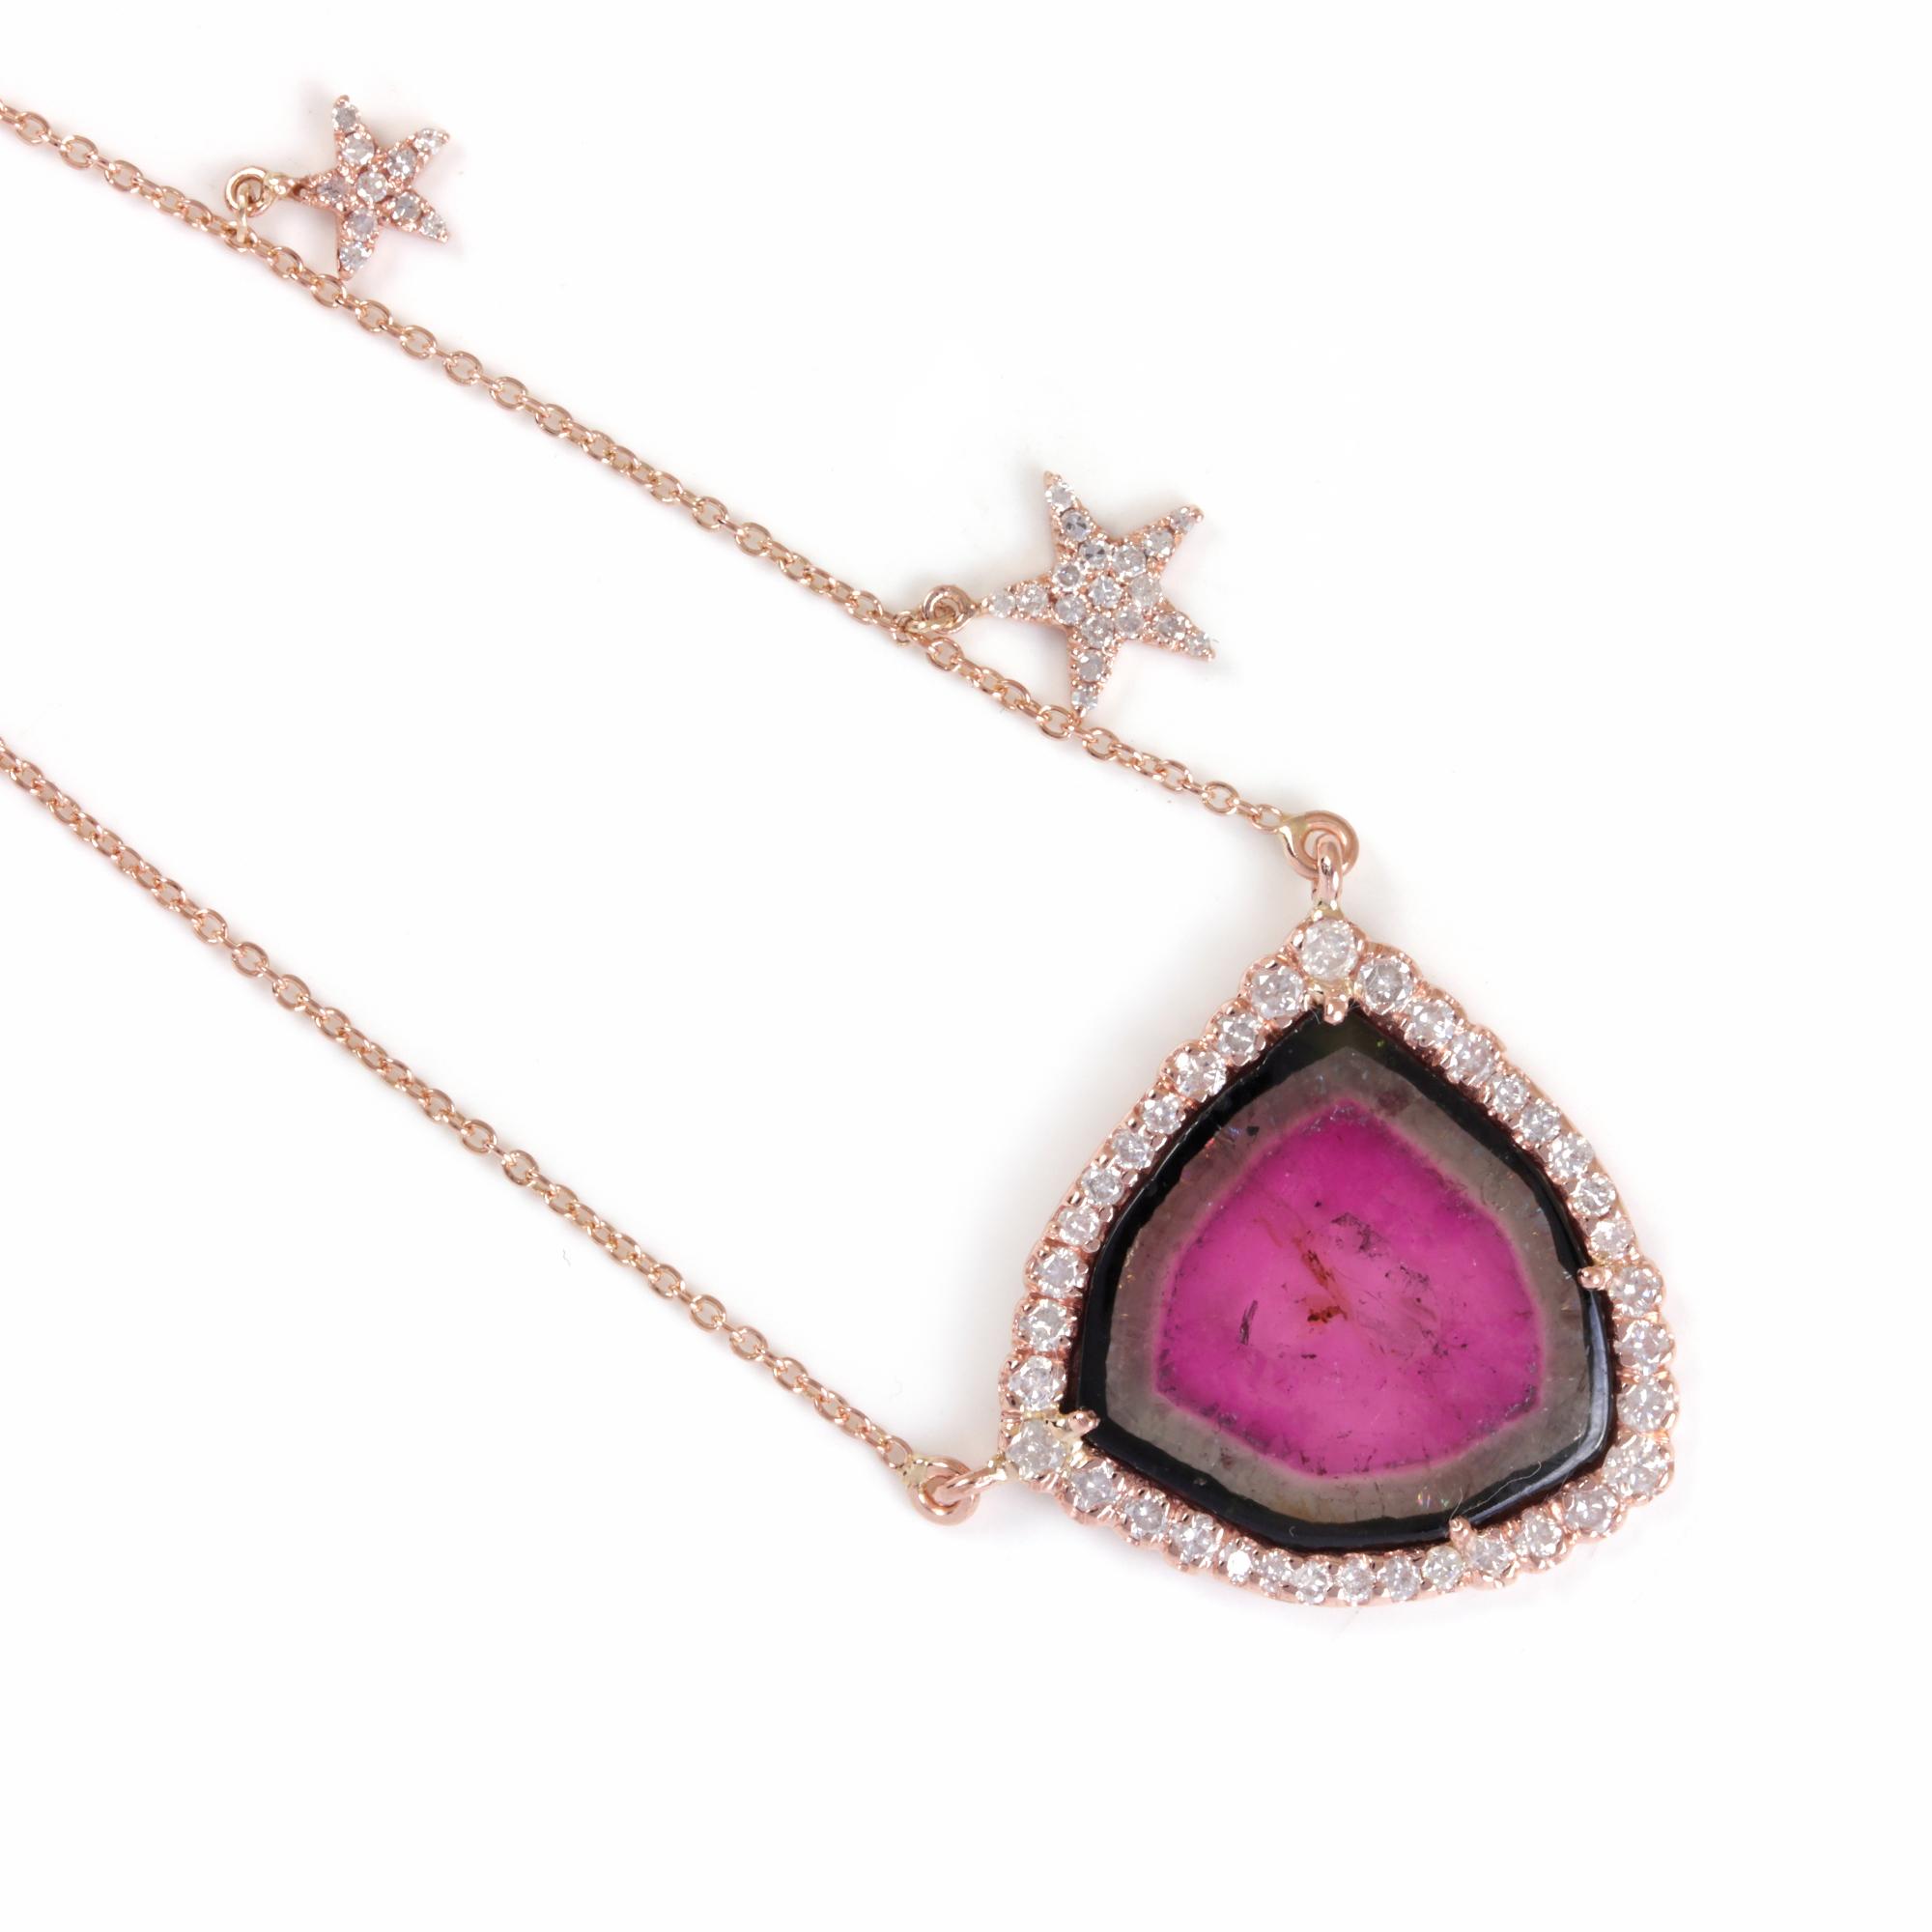 Pink Tourmaline 14K Solid Gold Pendant Necklace Pave Diamond Jewelry